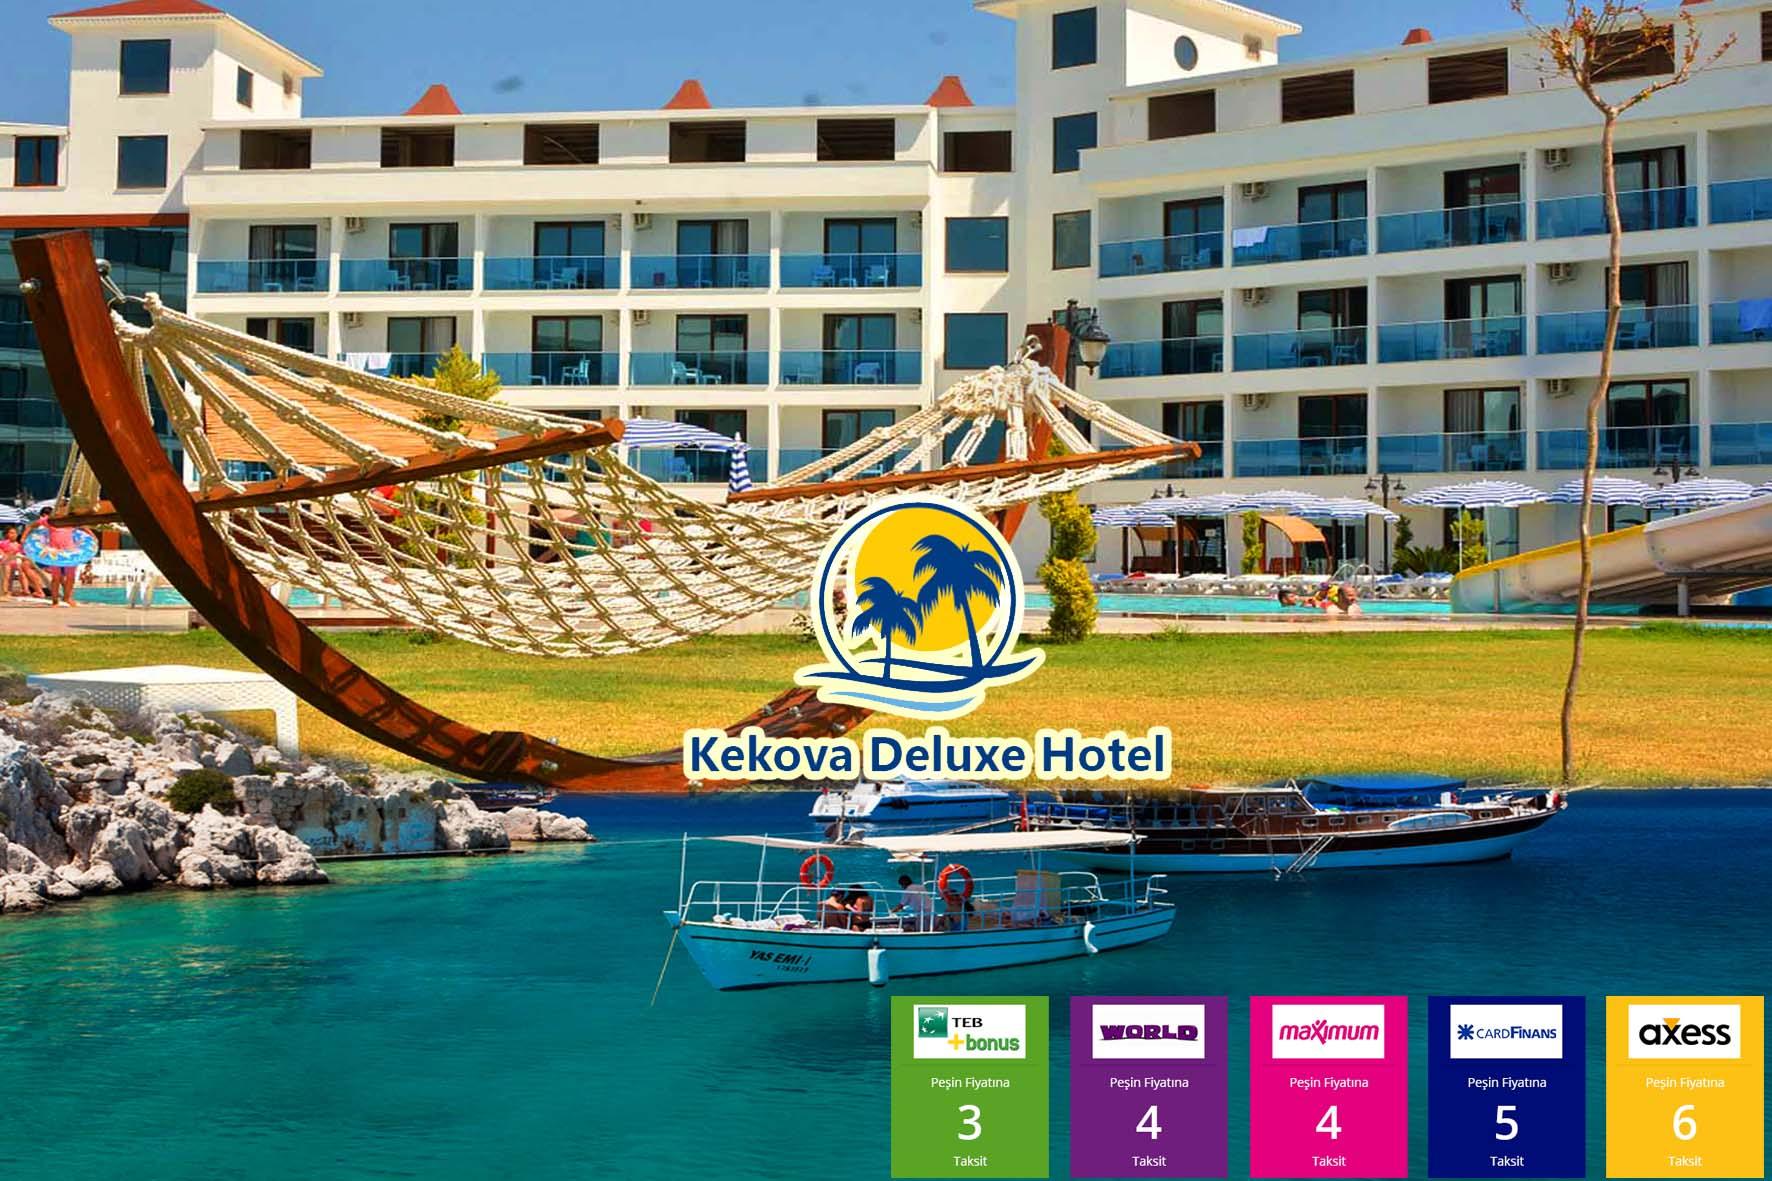 Kekova Deluxe Hotel262051